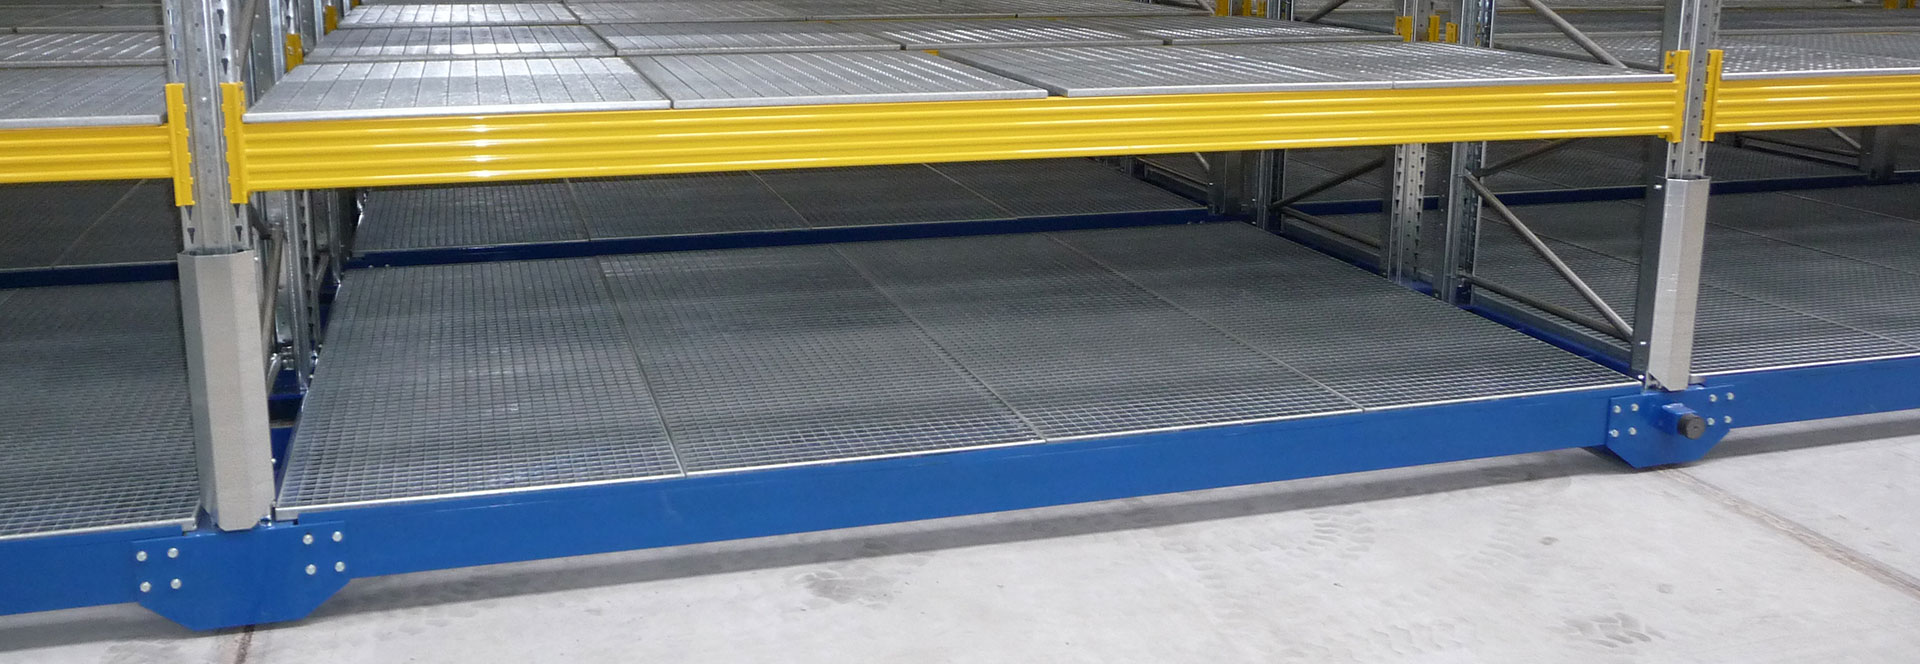 MEA Metal Applications - Referenzen Tramdepot München